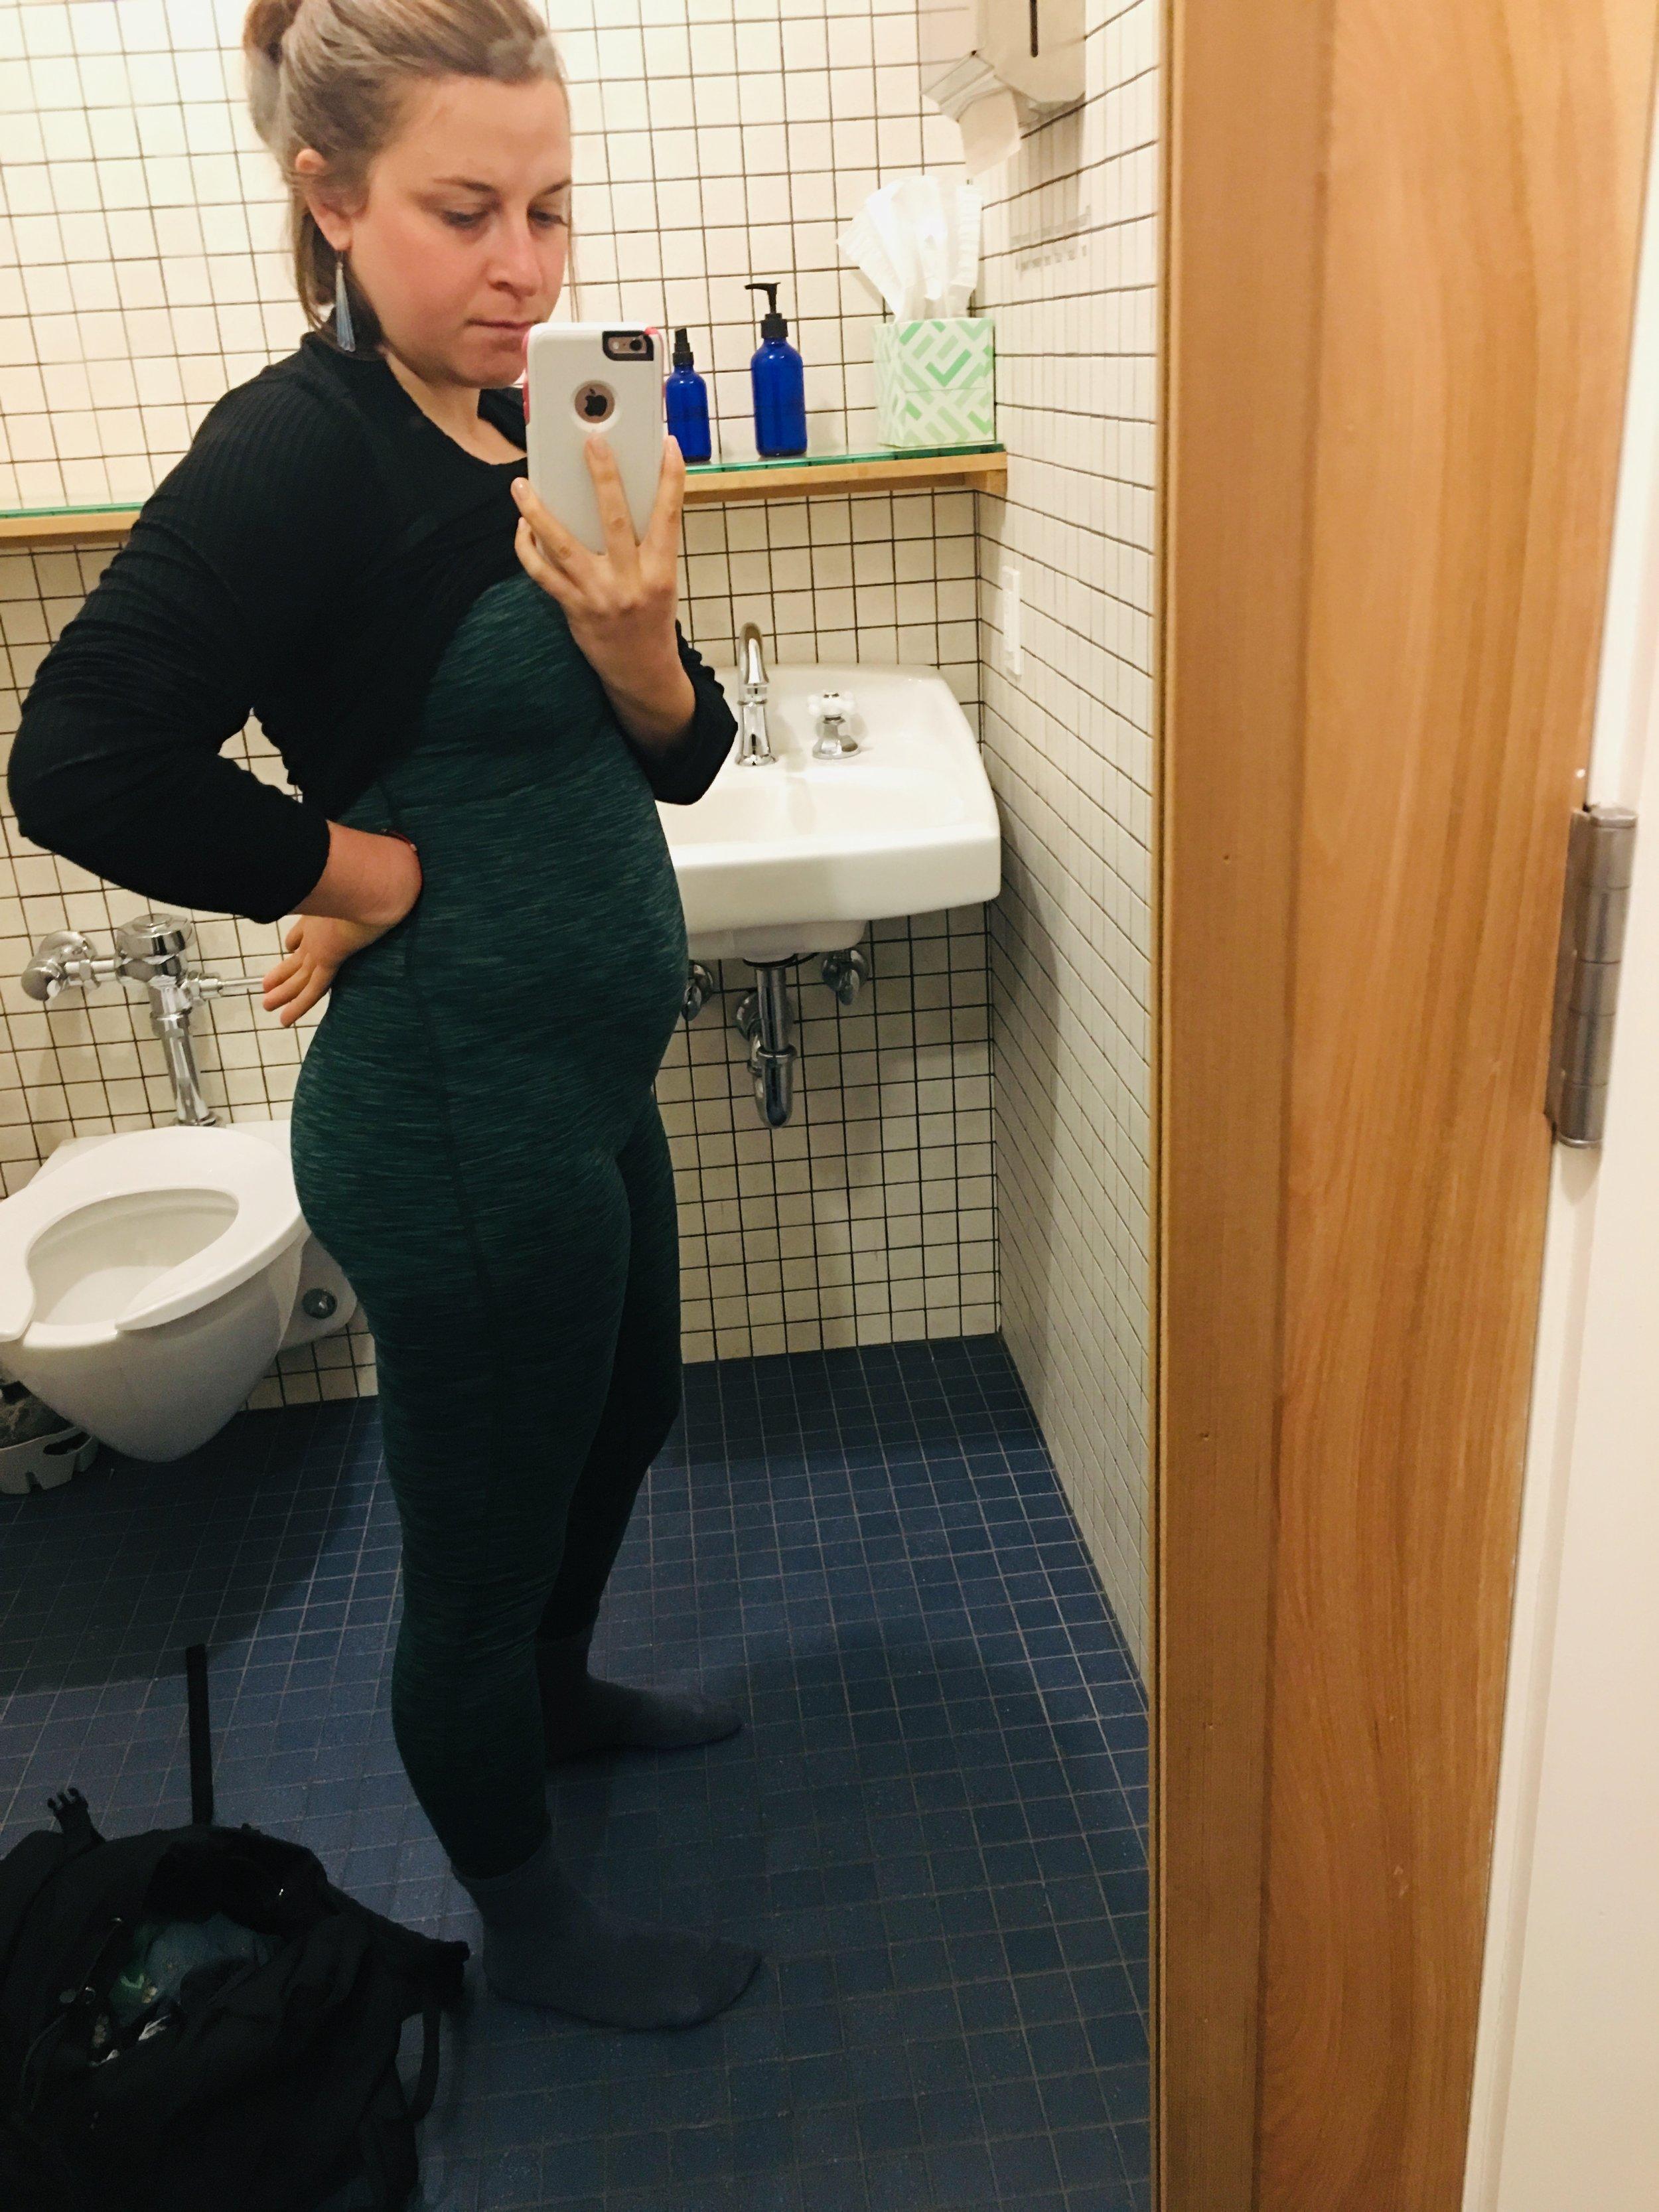 Real life - me a few weeks ago, mega bloated before yoga.